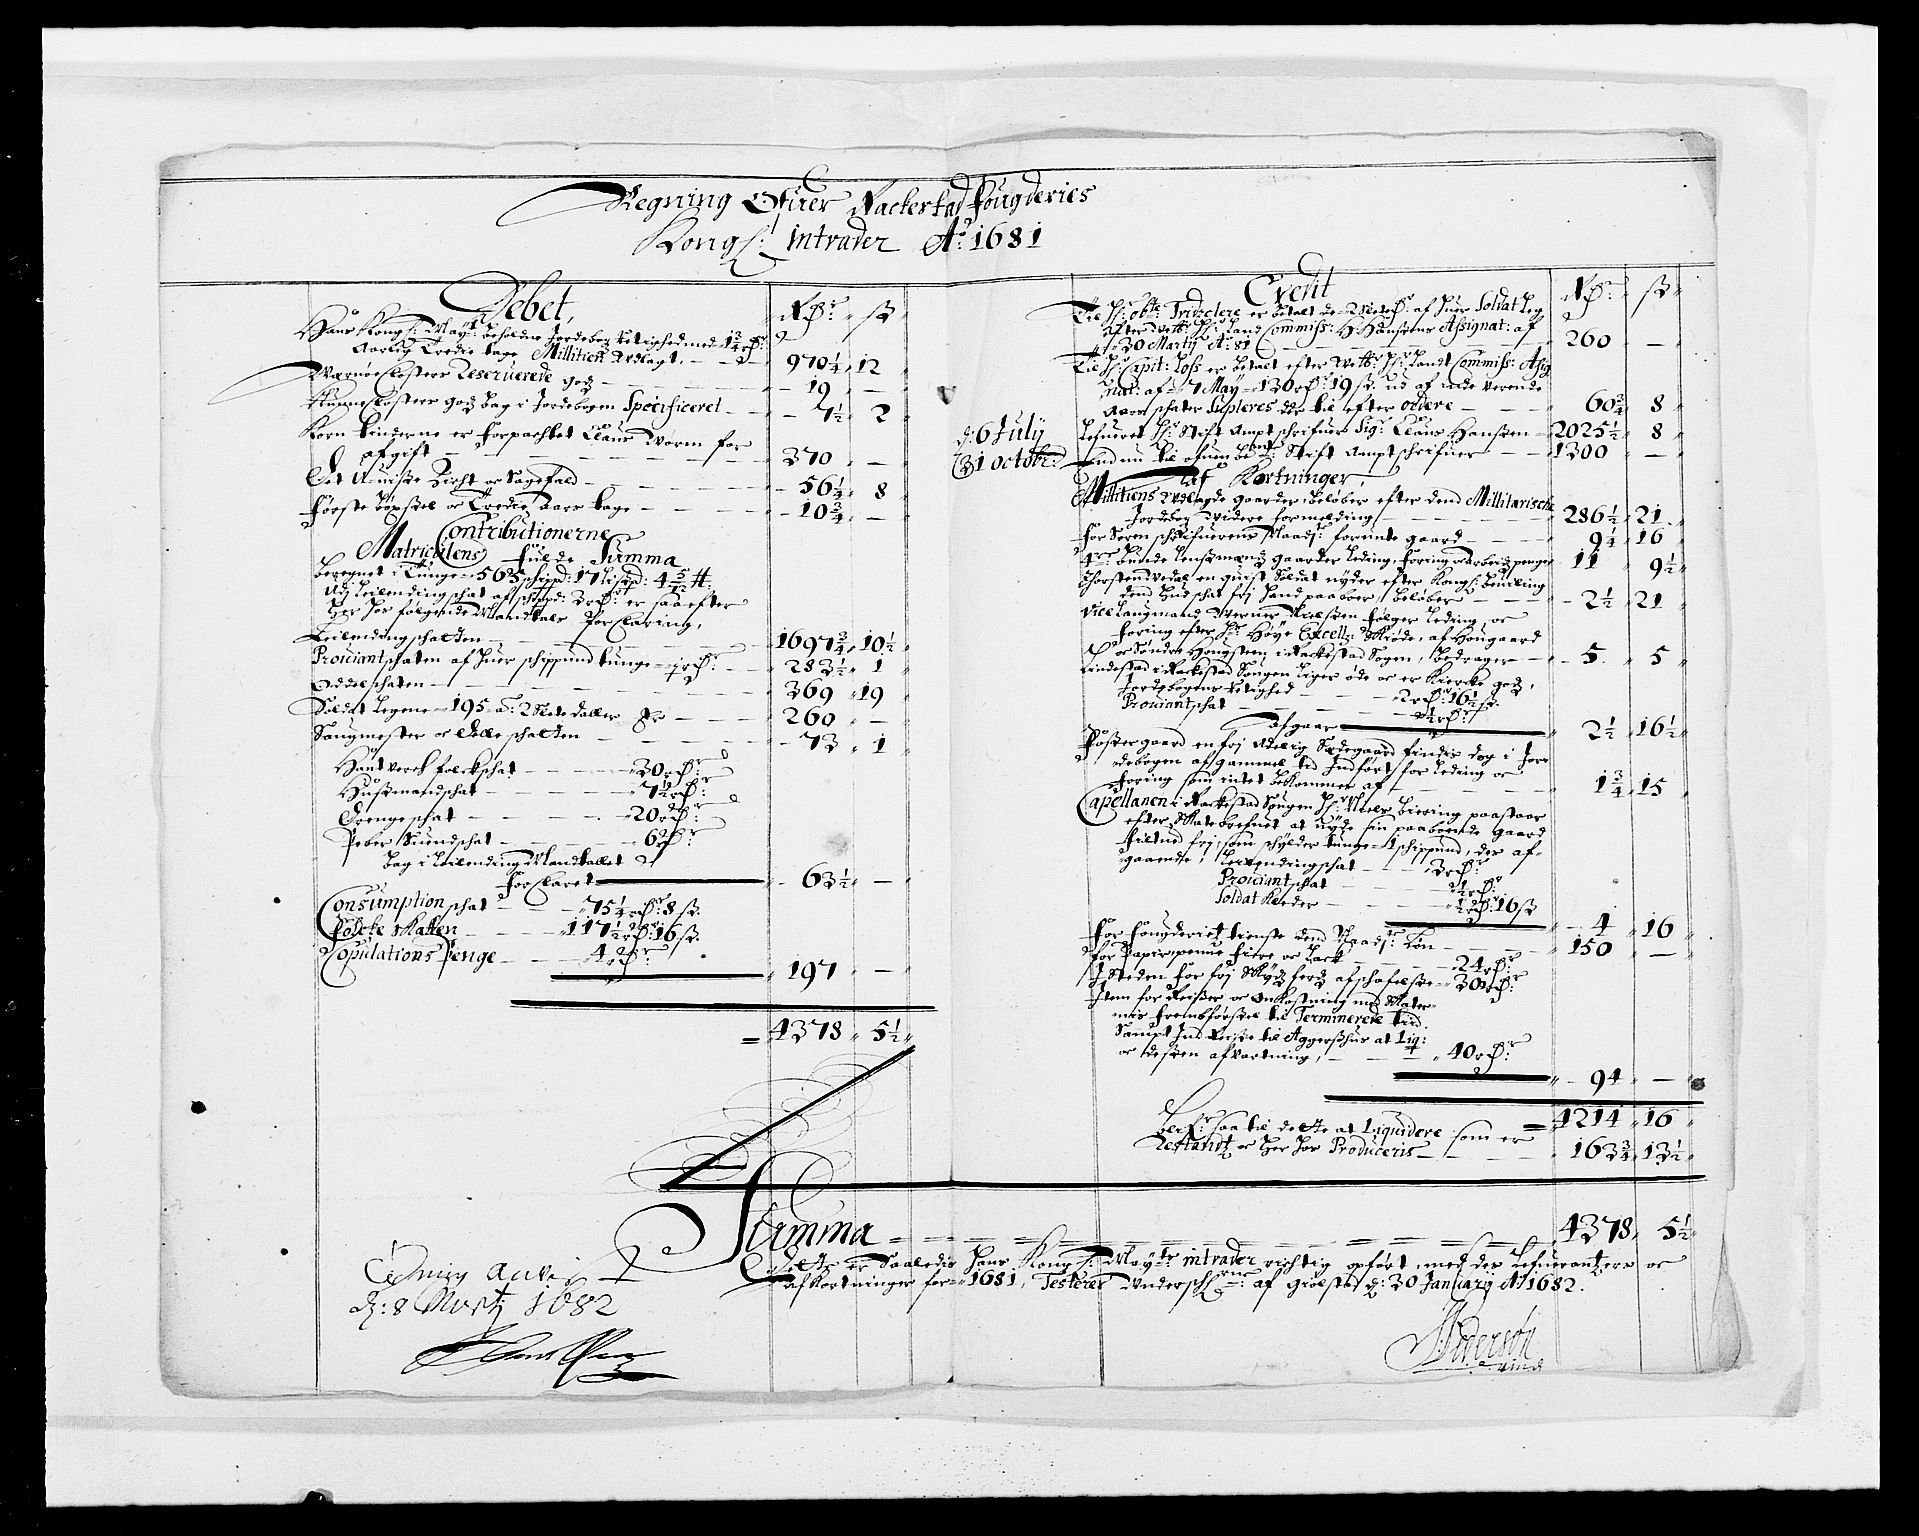 RA, Rentekammeret inntil 1814, Reviderte regnskaper, Fogderegnskap, R05/L0272: Fogderegnskap Rakkestad, 1680-1681, s. 209